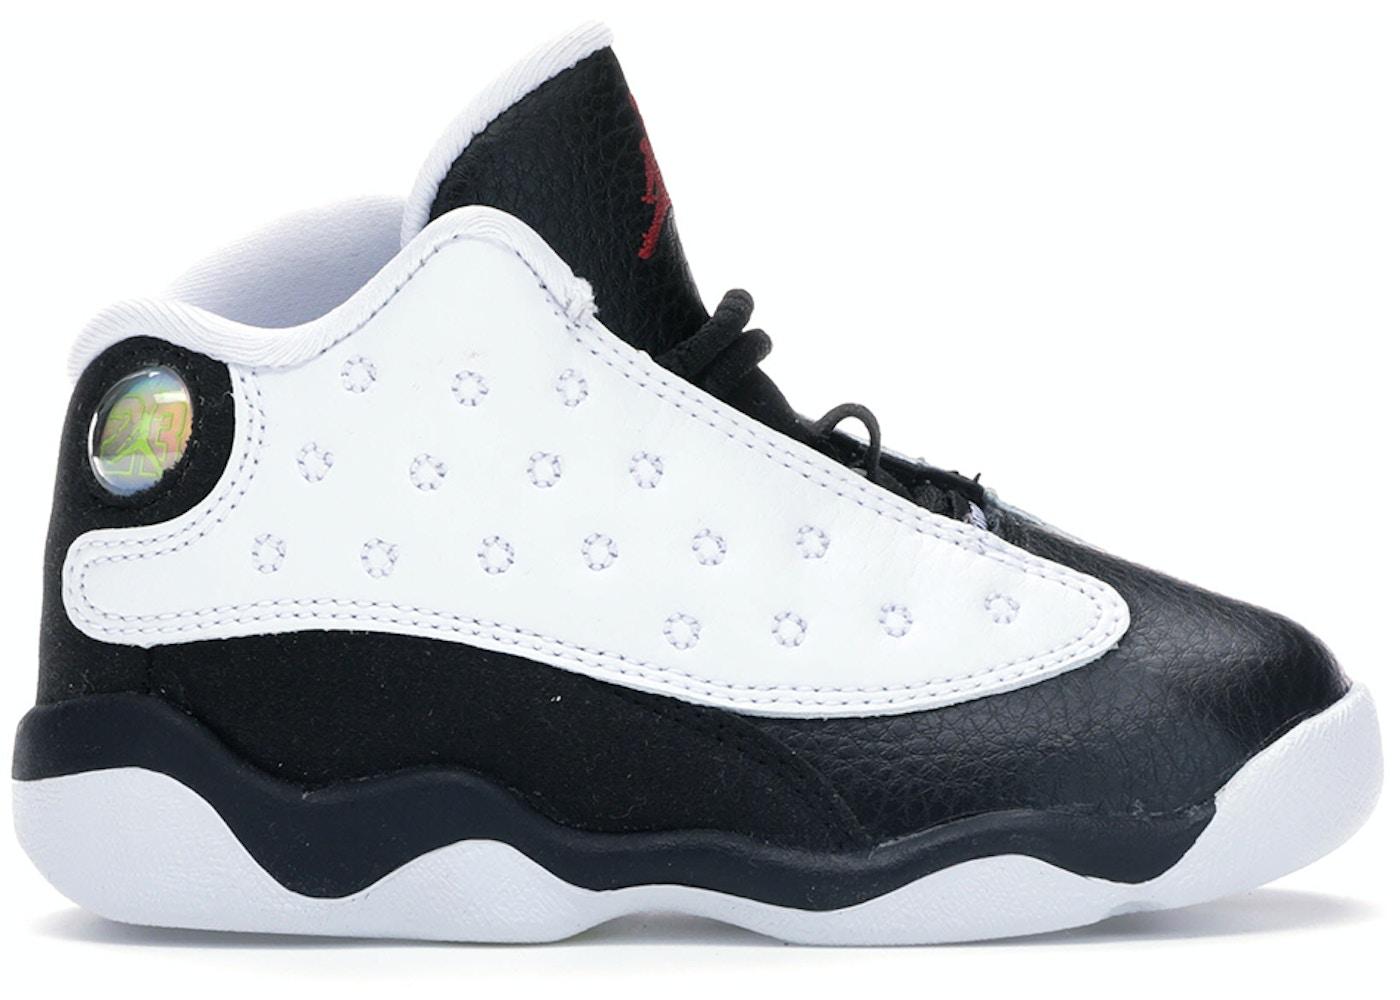 timeless design eda99 b5c2e Buy Air Jordan 13 Size 8 Shoes   Deadstock Sneakers